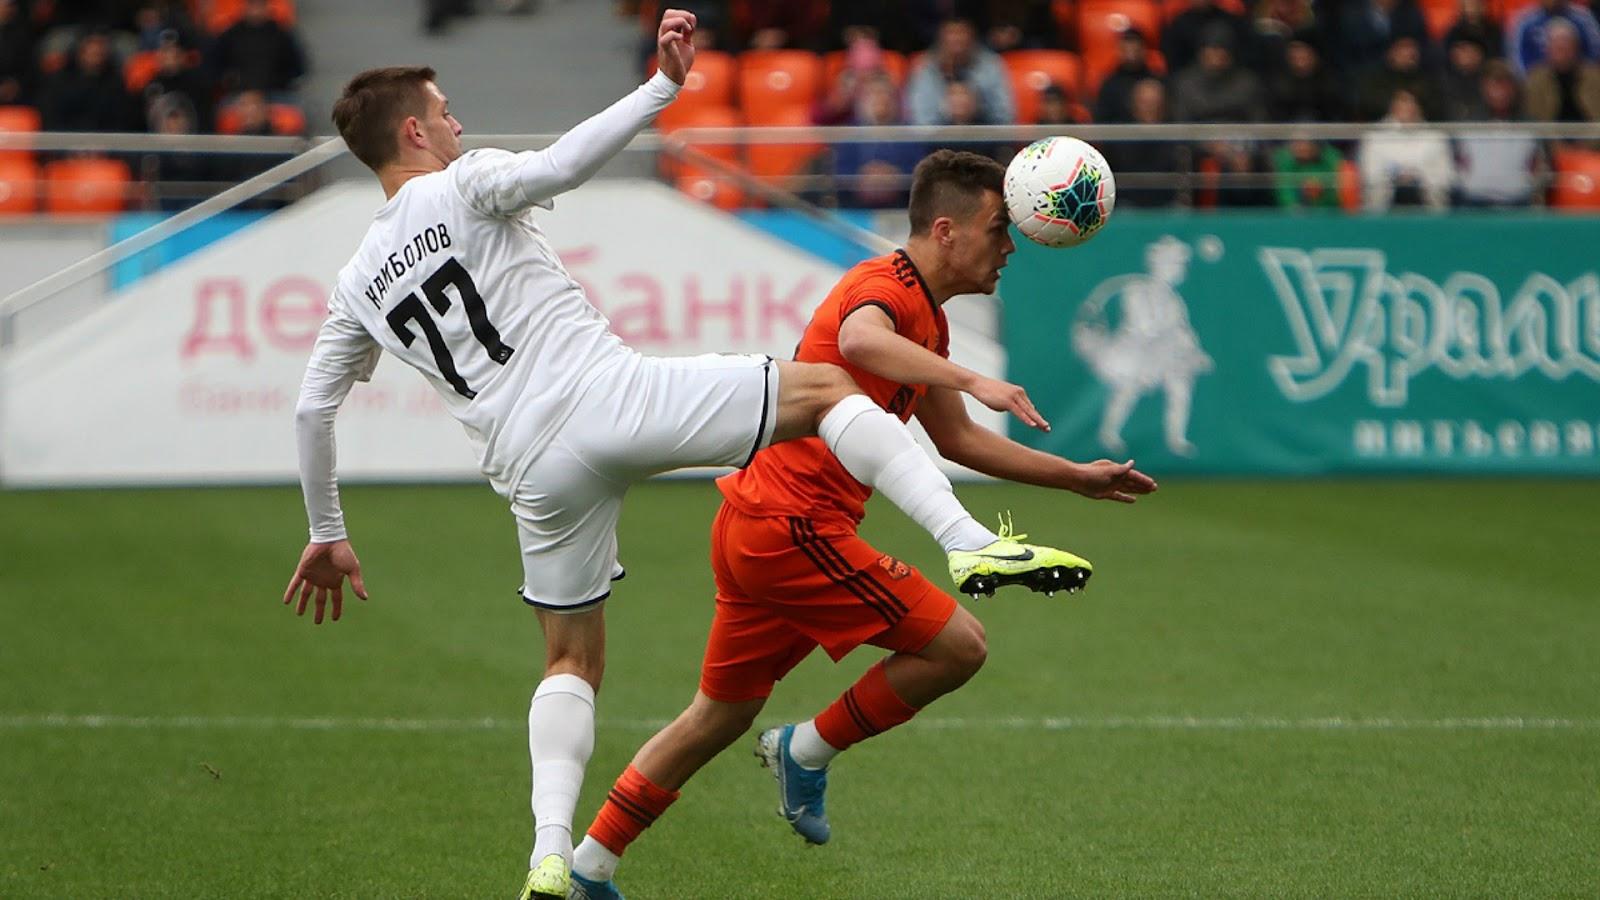 Юрий Бавин забил гол в матче против Краснодара